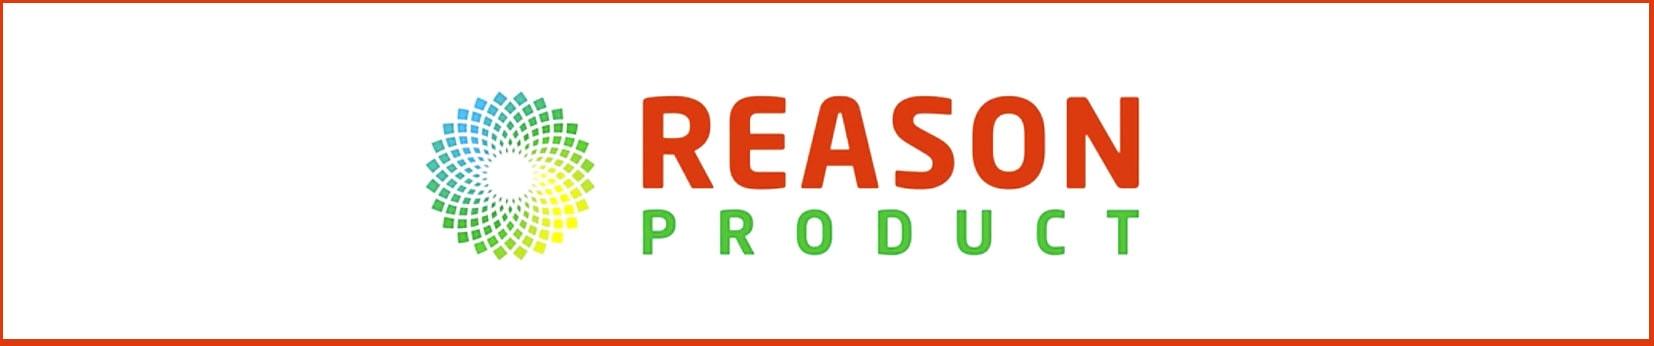 наши клиенты reason product